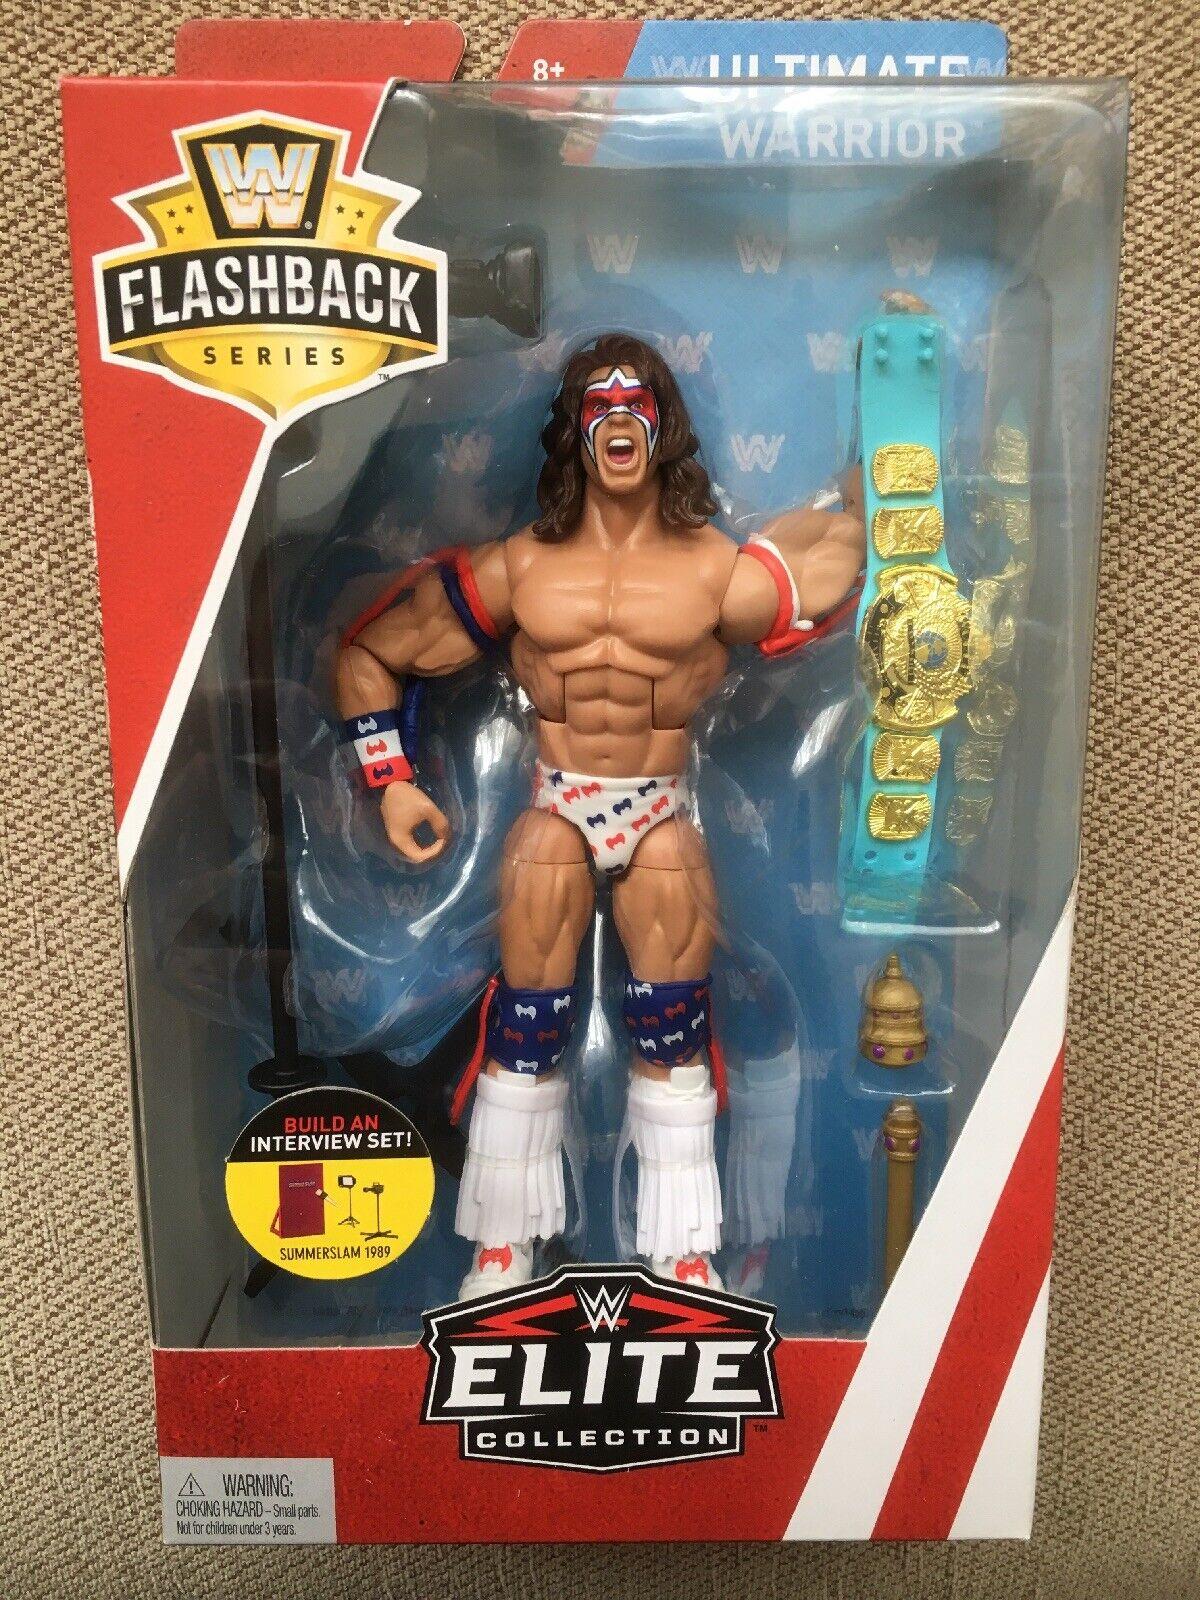 WWE NEW ULTIMATE WARRIOR MATTEL MATTEL MATTEL ELITE FLASHBACK SERIES WRESTLING FIGURE BNIB 940